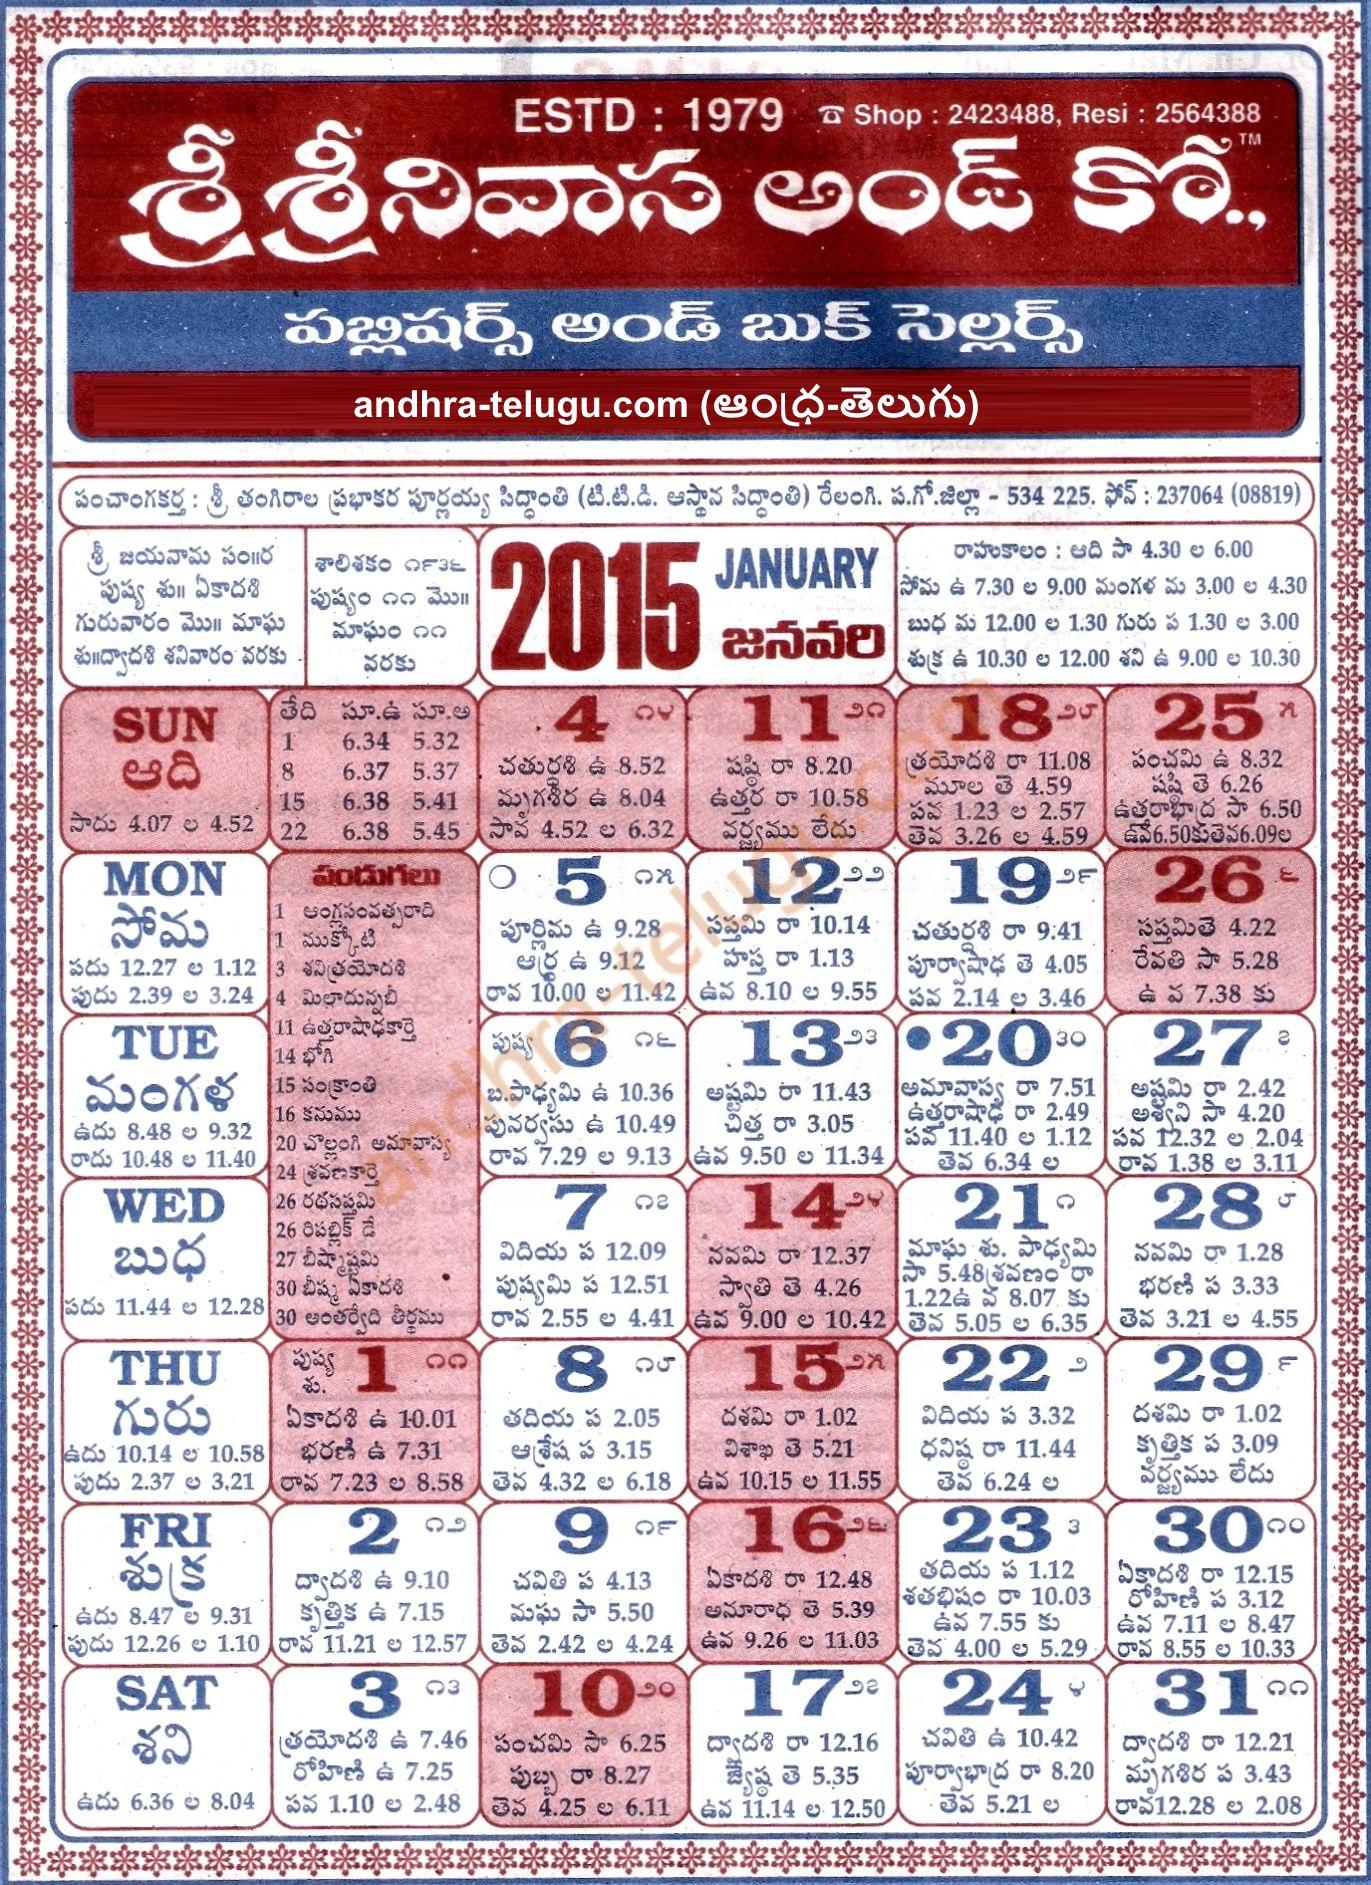 Andhrajyothy Calendar 2015 Pdf